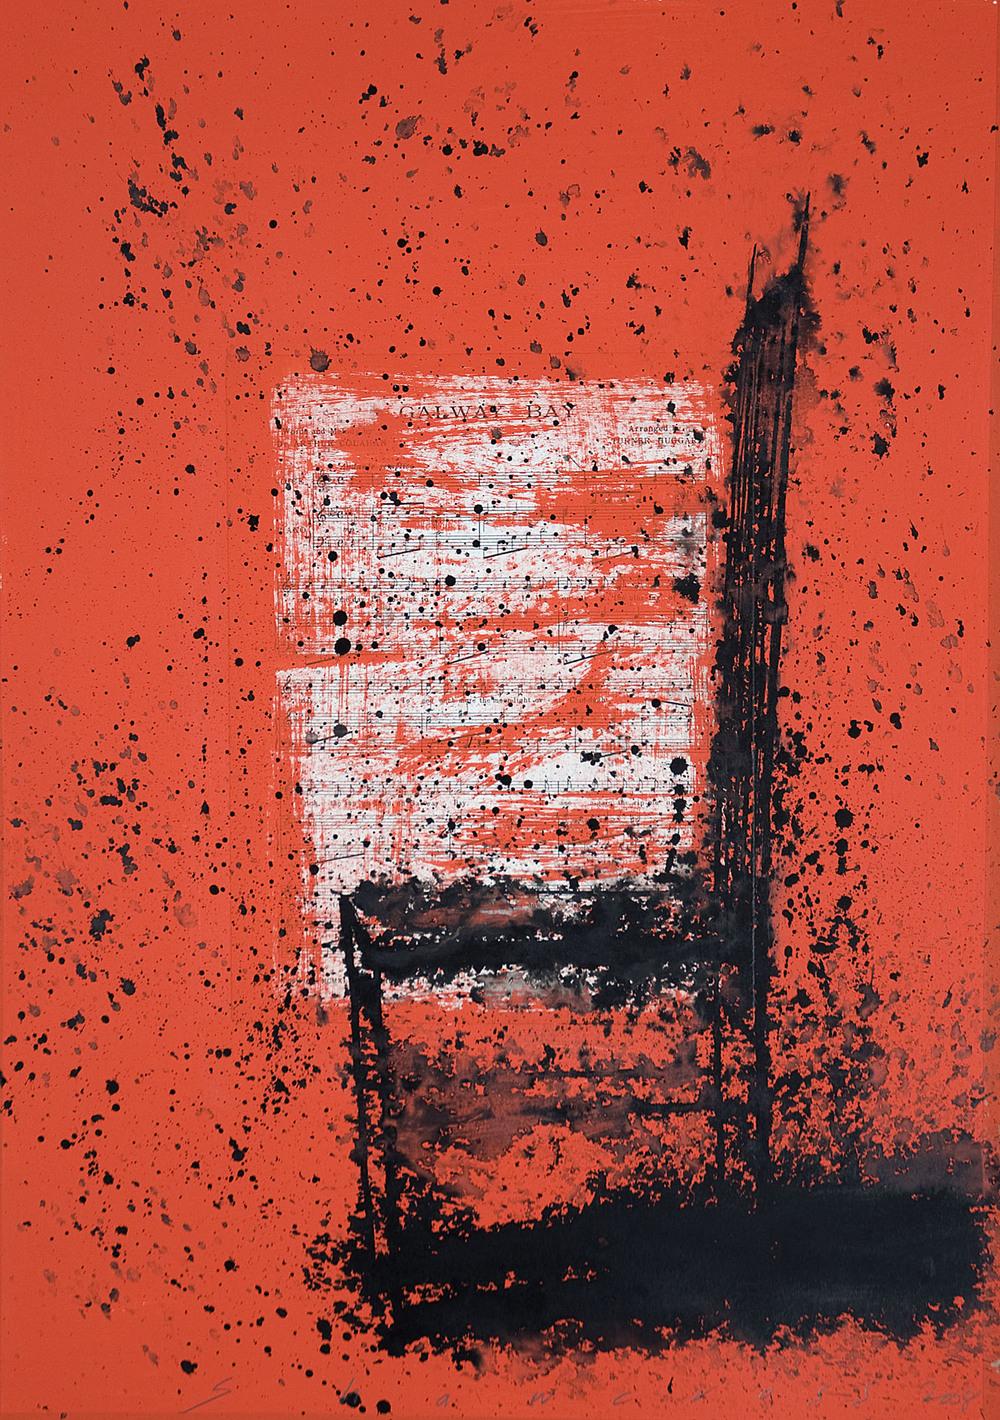 Neil Shawcross_-_#23_acrylic on paper_63.5 x 46cm.jpg